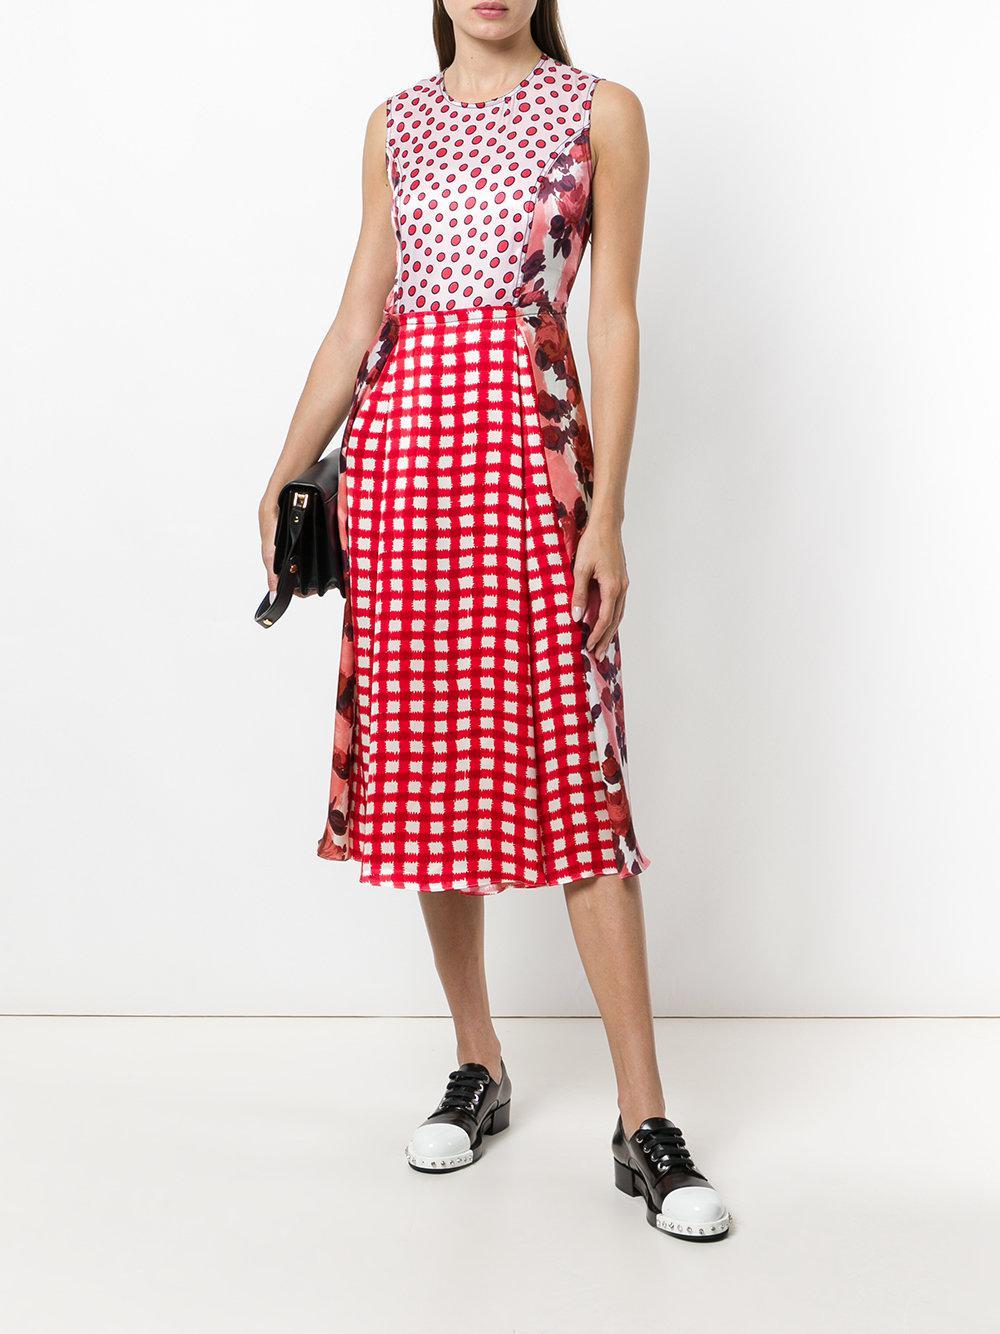 8fe02cc26ef Lyst - Marni Ingrid Print Midi Sundress in Red - Save 50%